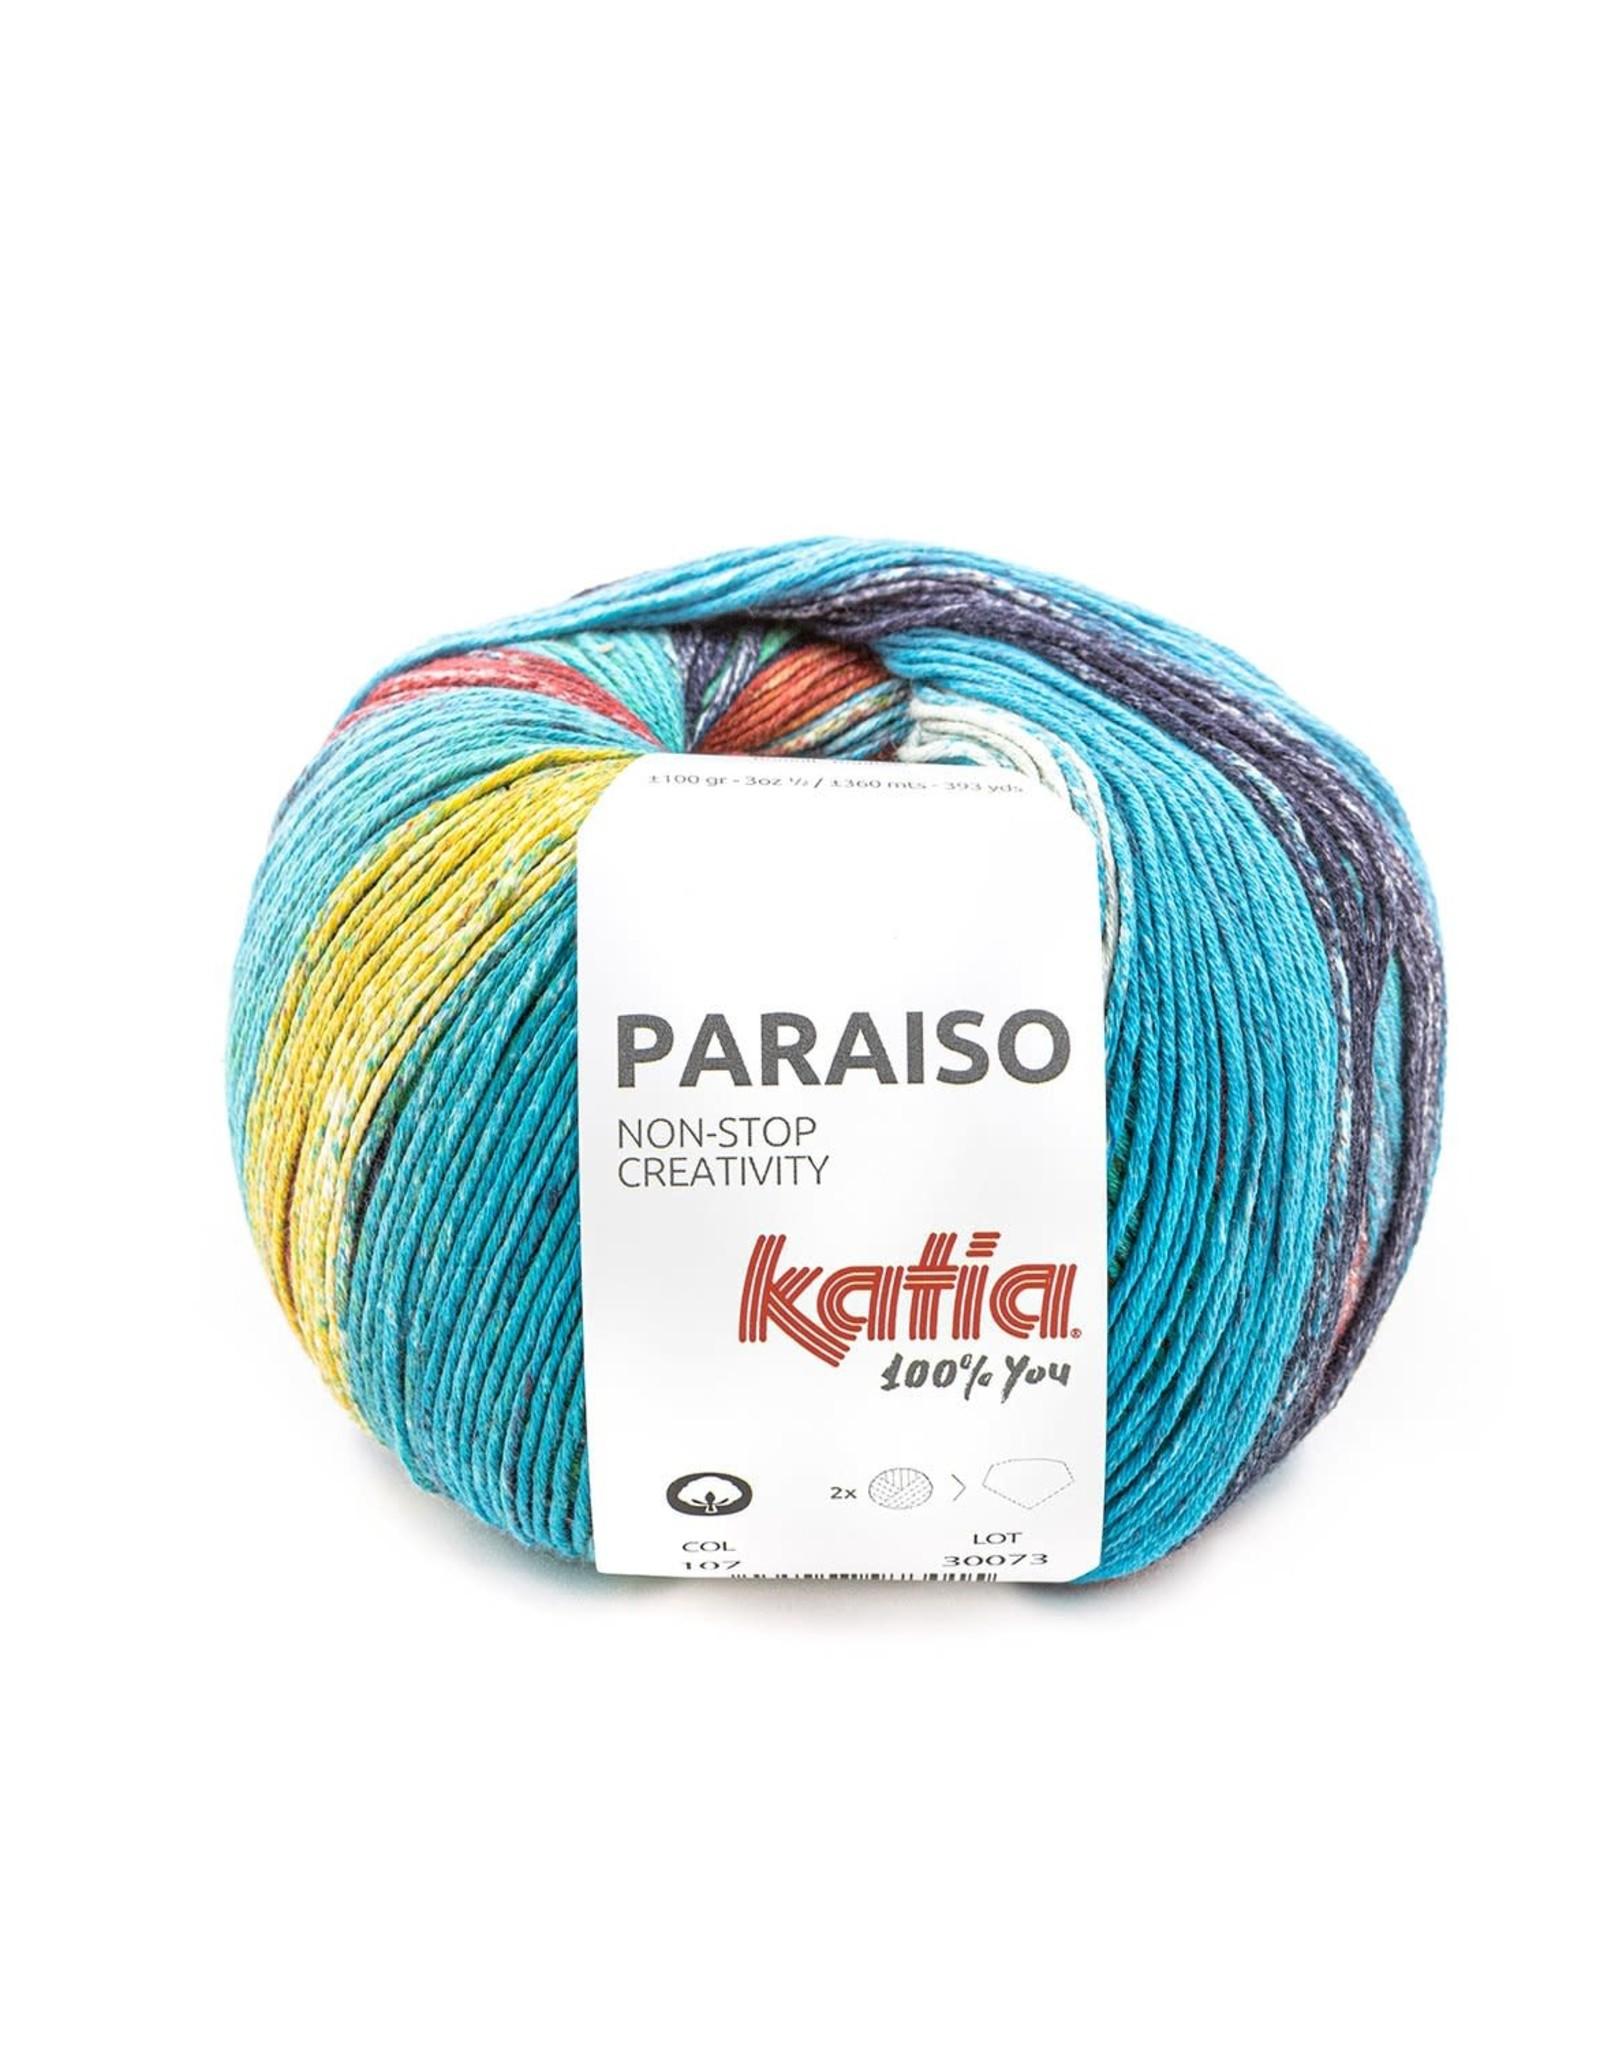 Katia Katia Paraiso 107 - Groen-Blauw-Rood-Geel-Donker blauw